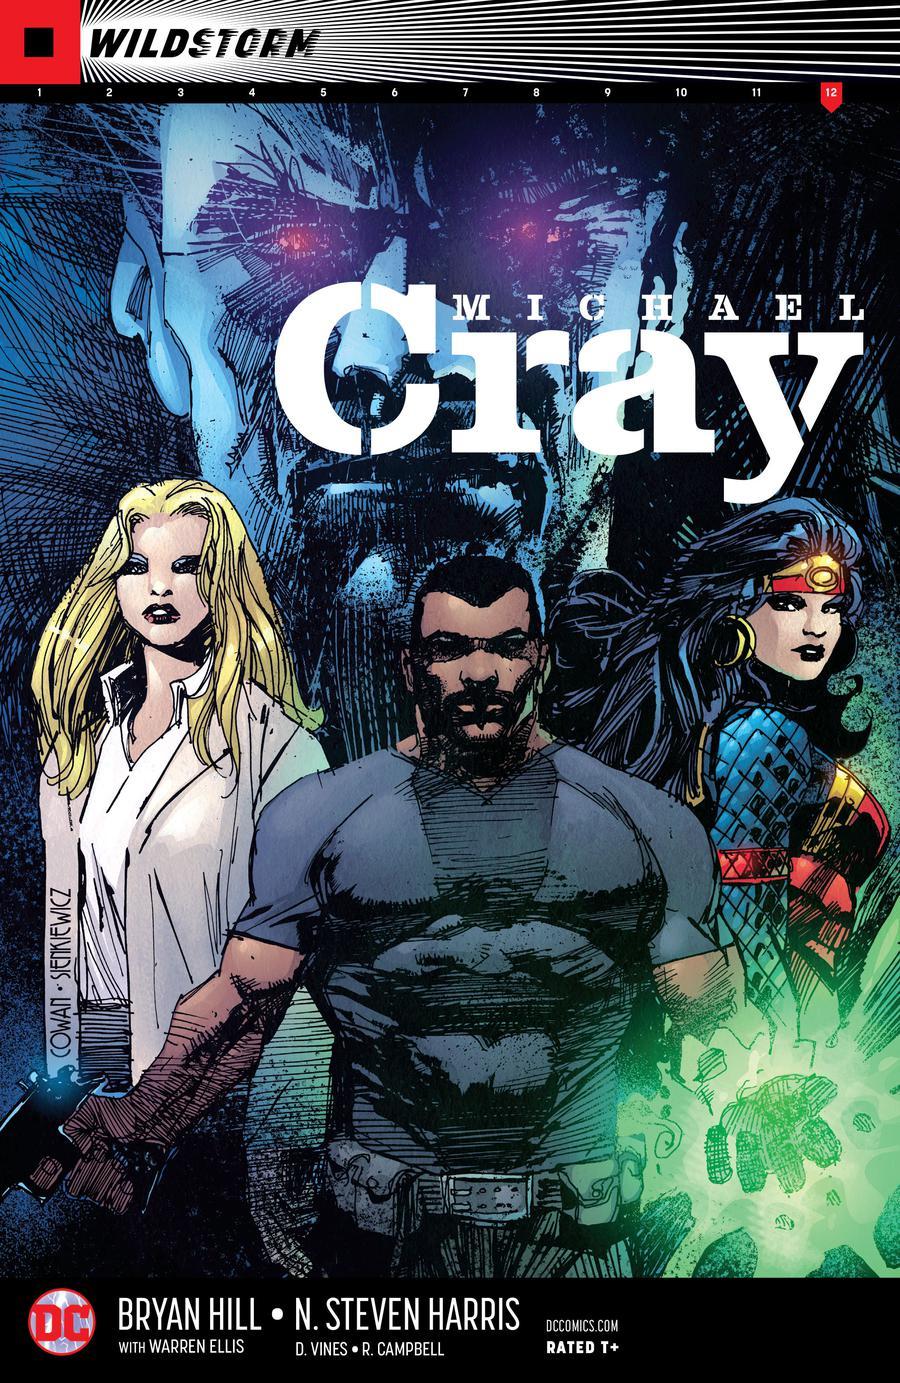 Wildstorm Michael Cray #12